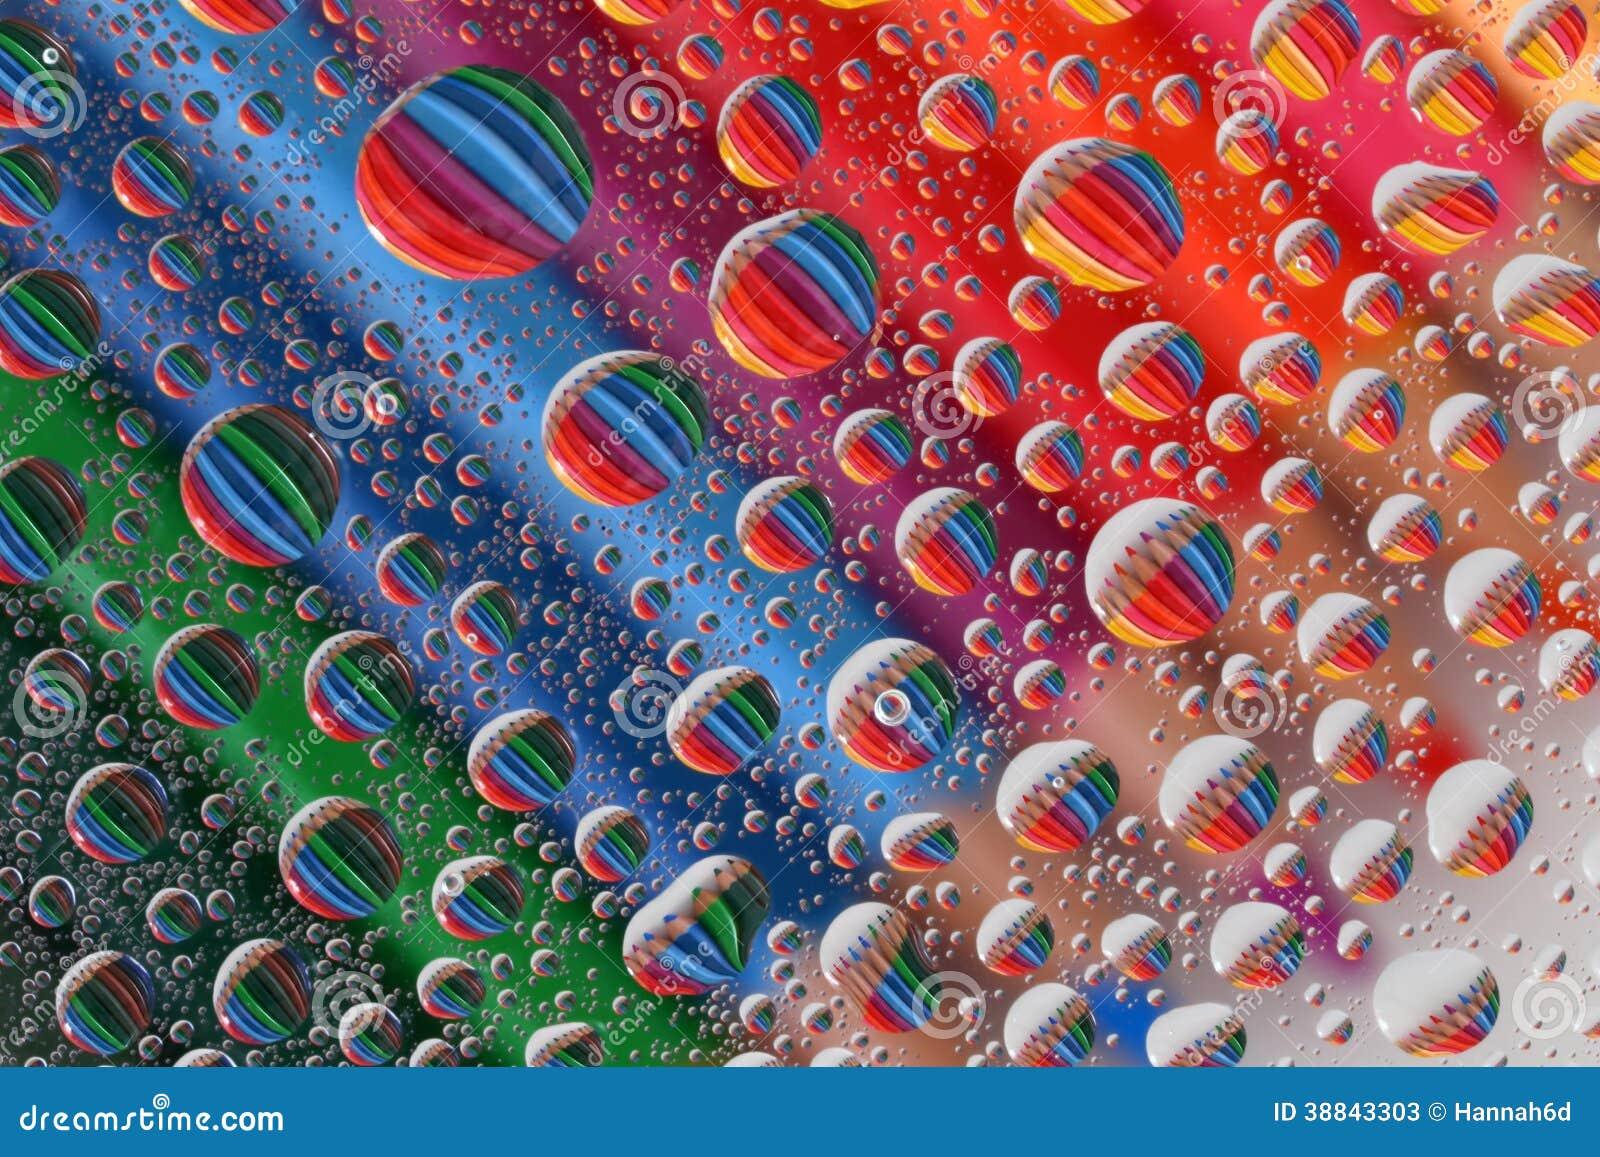 water droplet unique wallpaperjpeg - photo #38